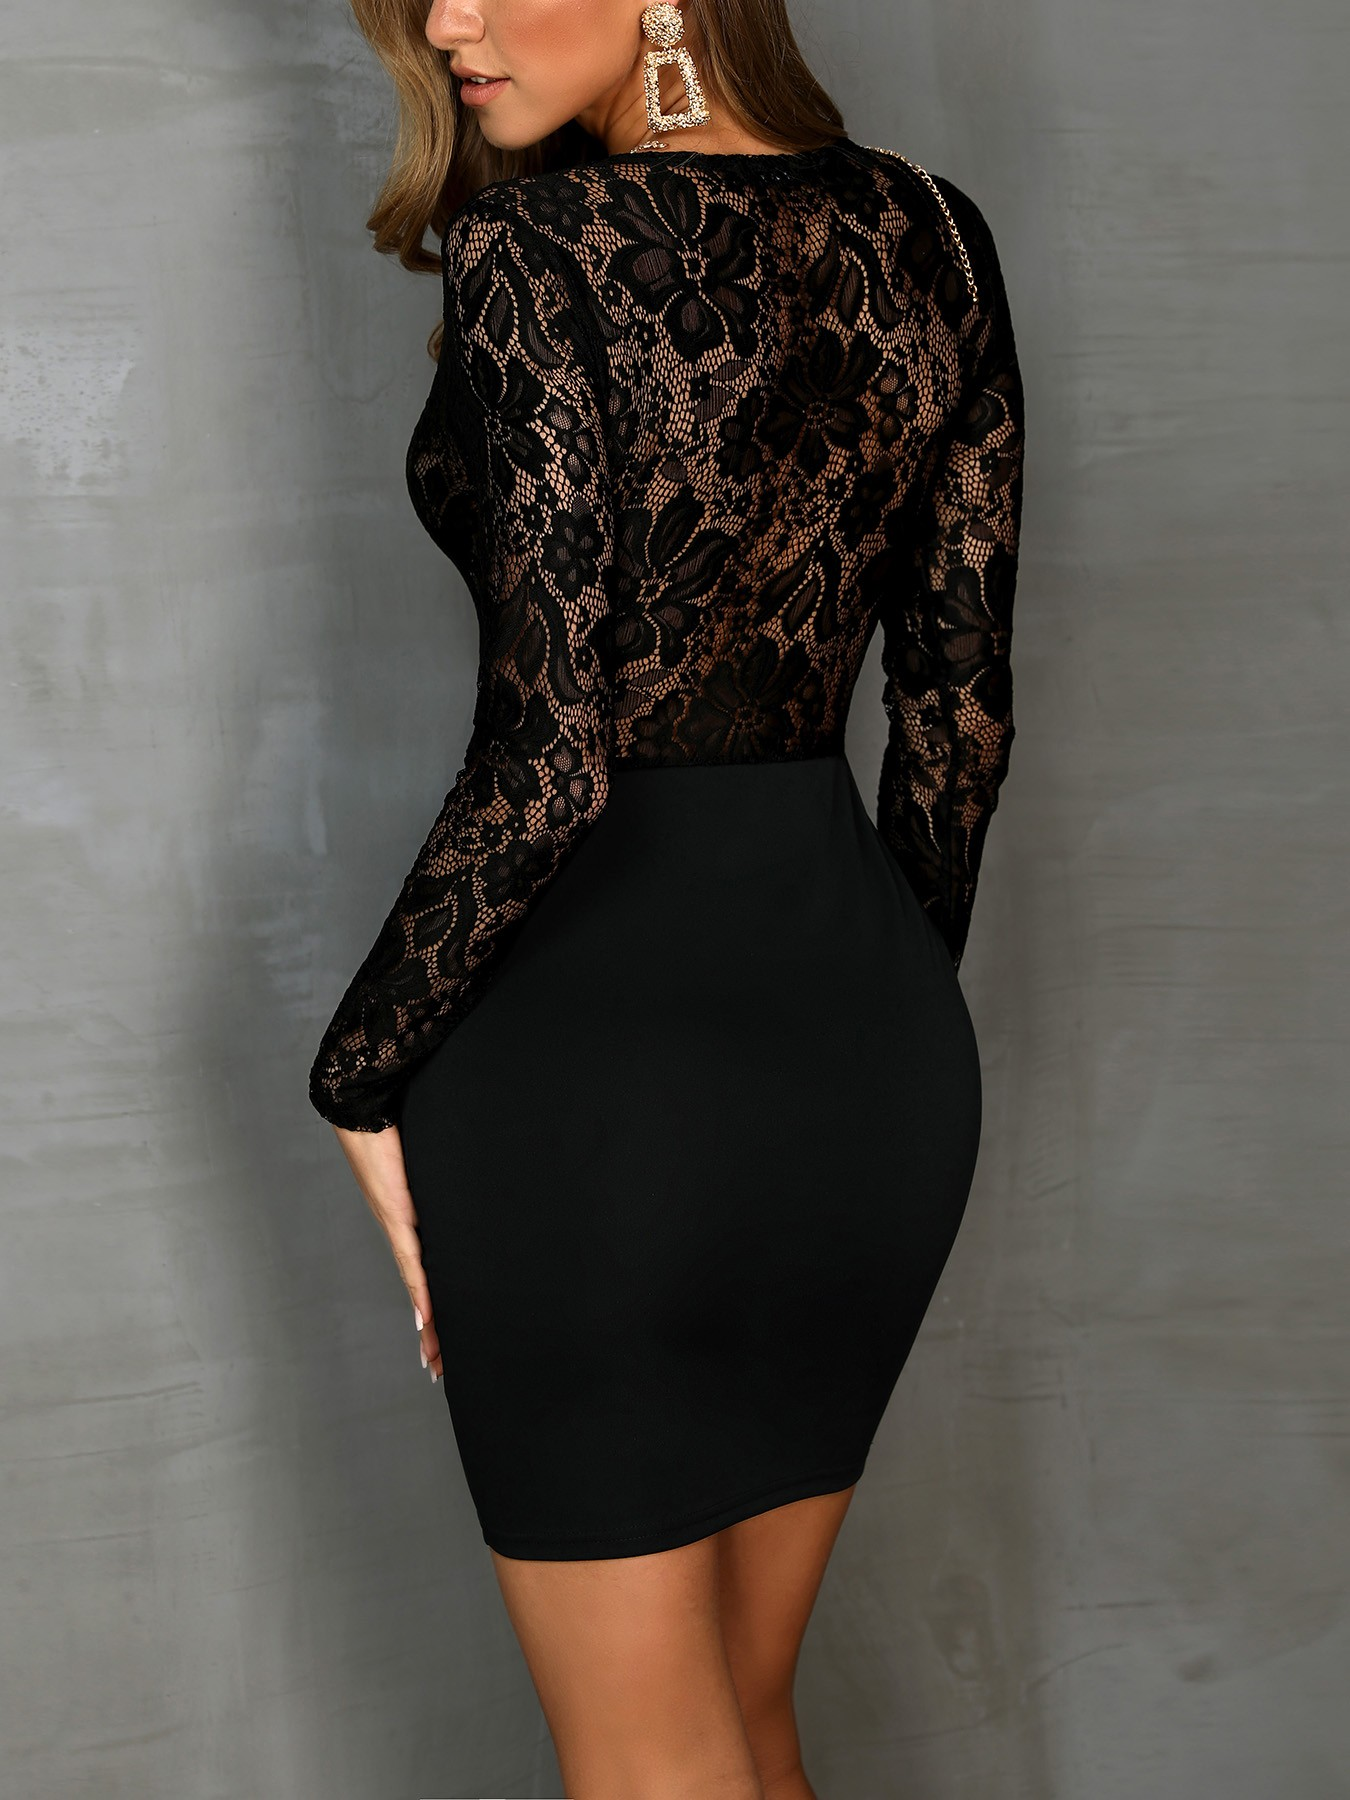 boutiquefeel / V-Neck Long Sleeve Lace Bodice Dress